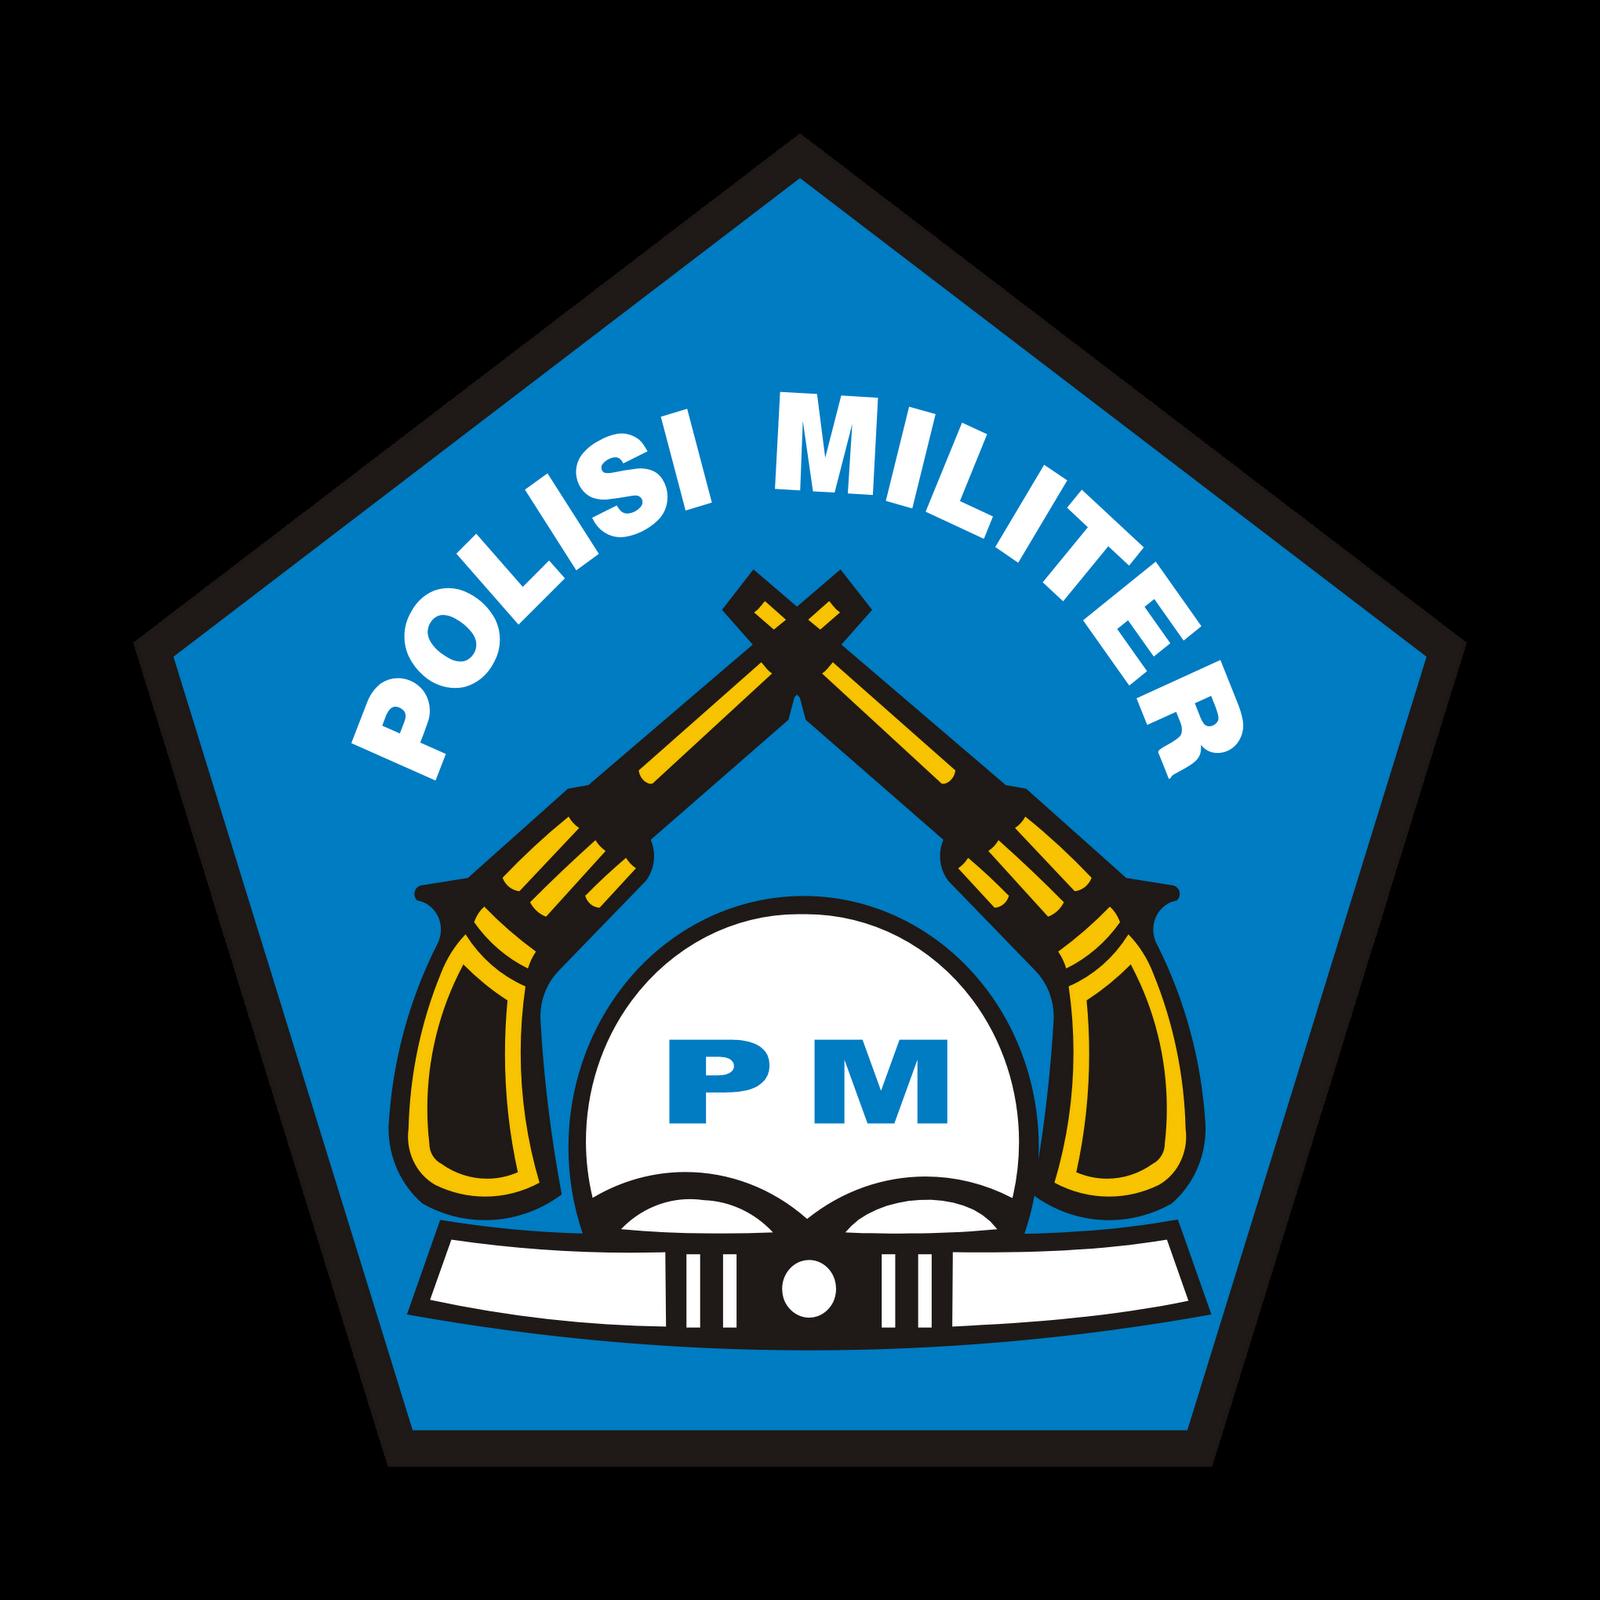 Polisi Militer Indonesia Logo Polisi Militer